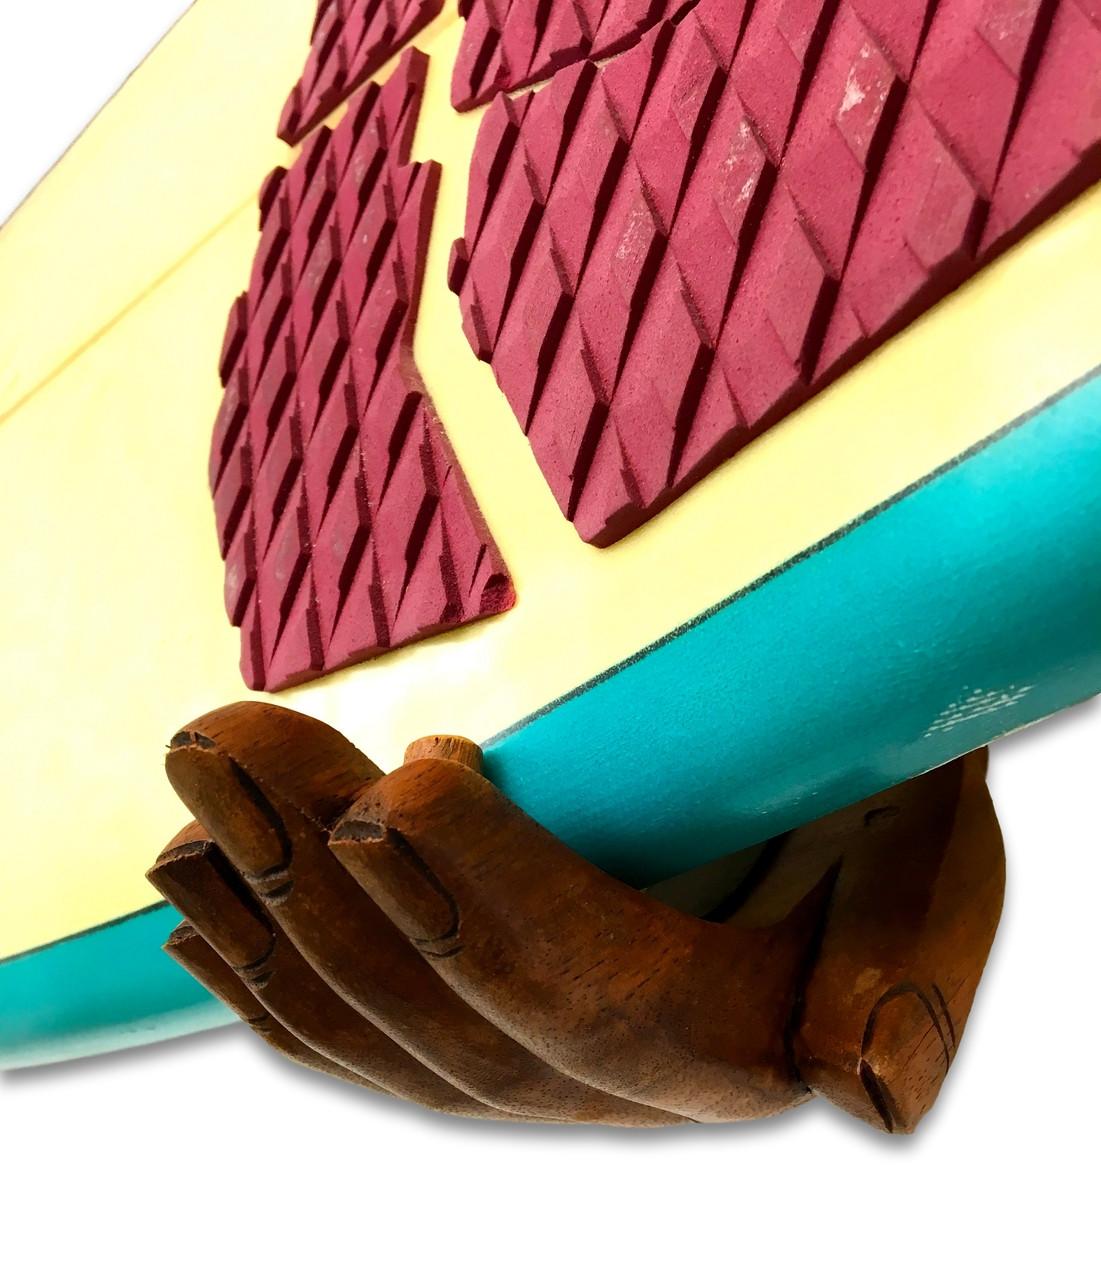 Handcrafted Wood Hands   Surfboard Wall Display Rack